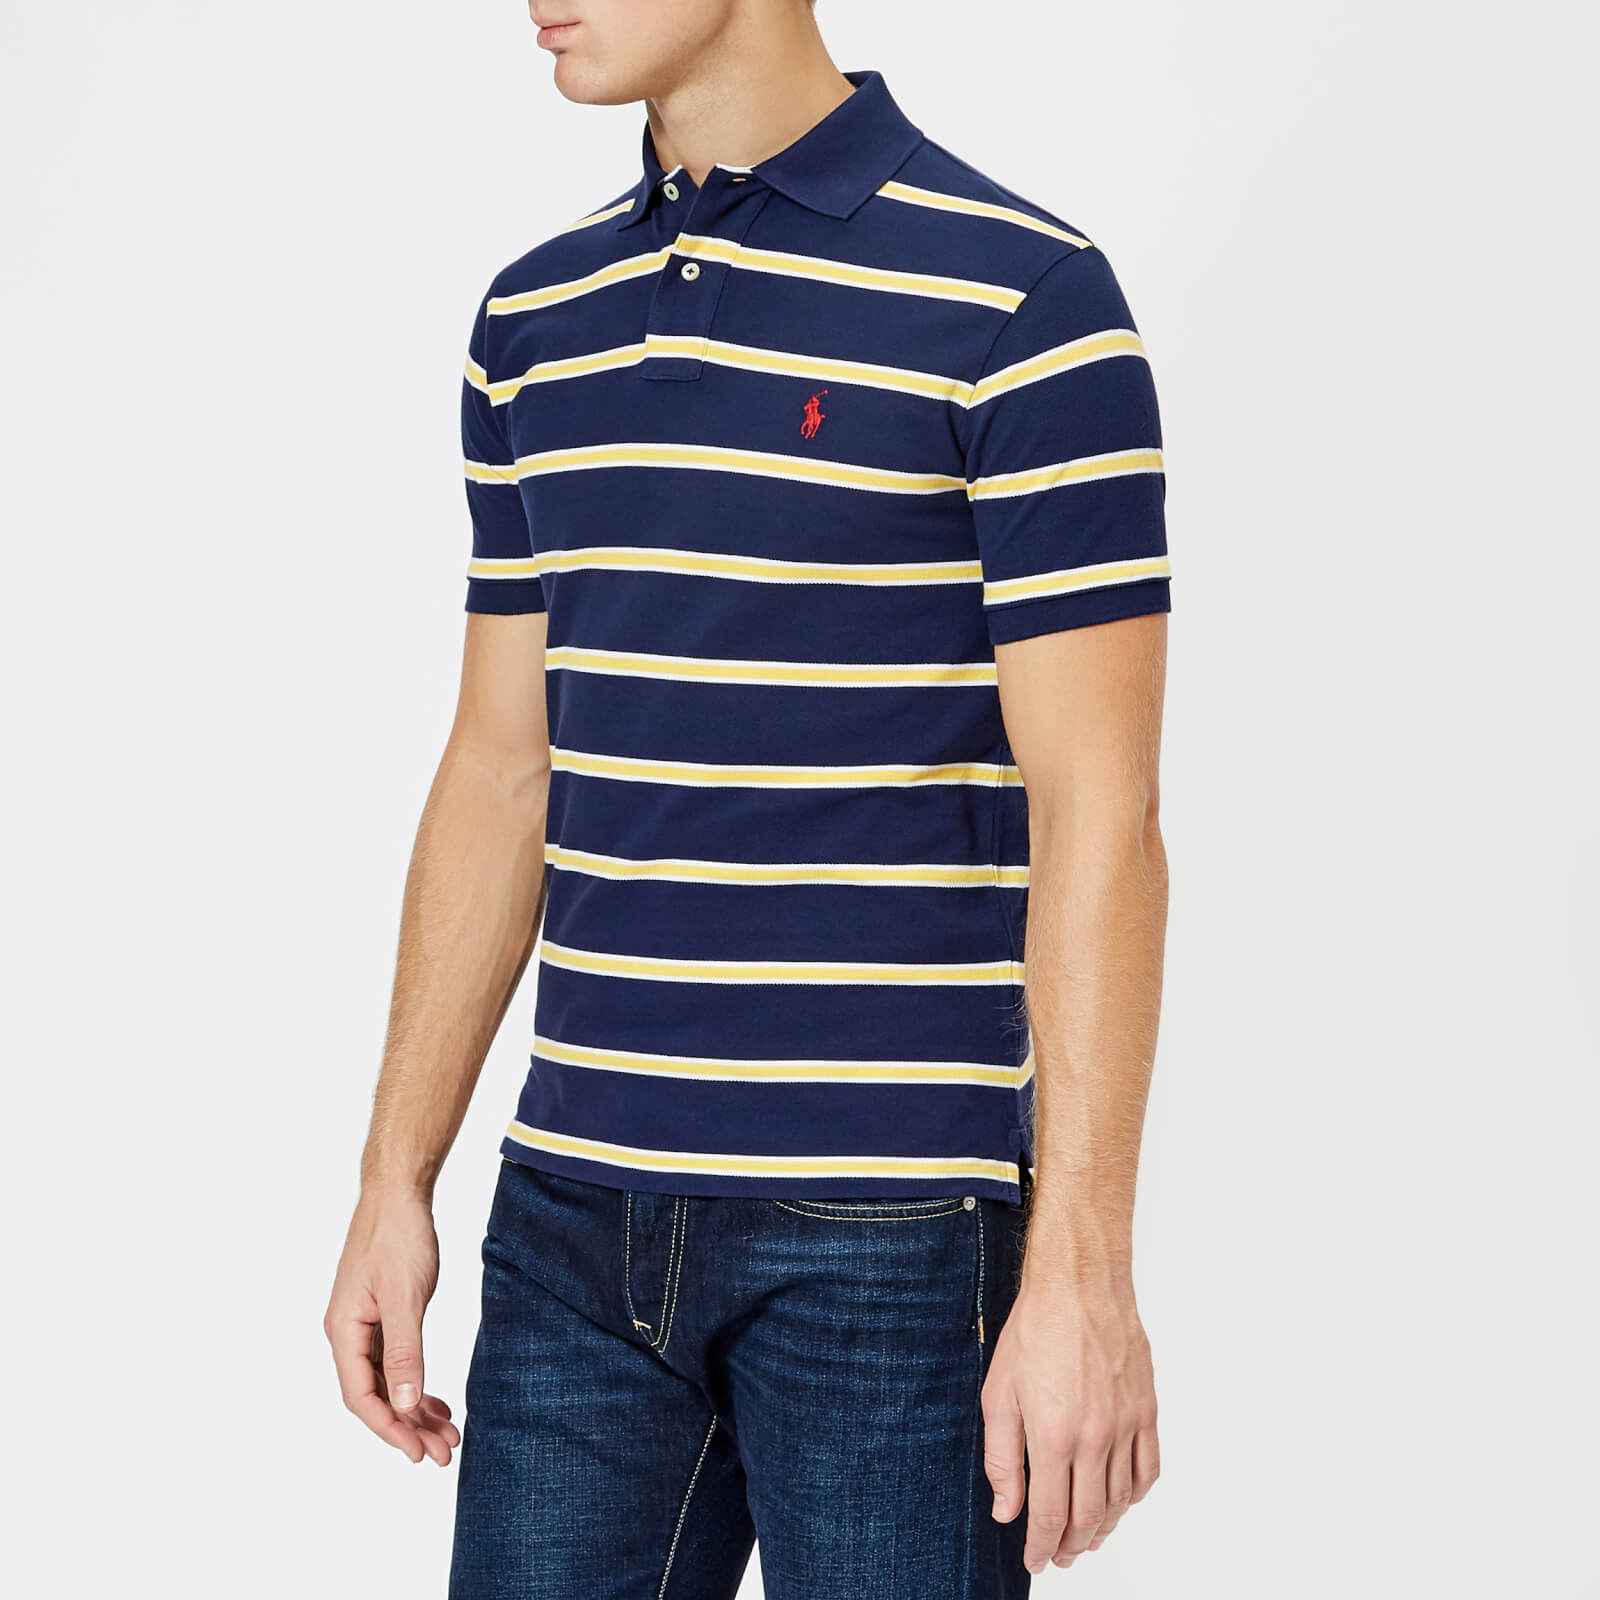 b0aa9c24e77e9 Polo Ralph Lauren Men s Stripe Short Sleeve Polo Shirt - Newport Navy Artic  Yellow - Free UK Delivery over £50